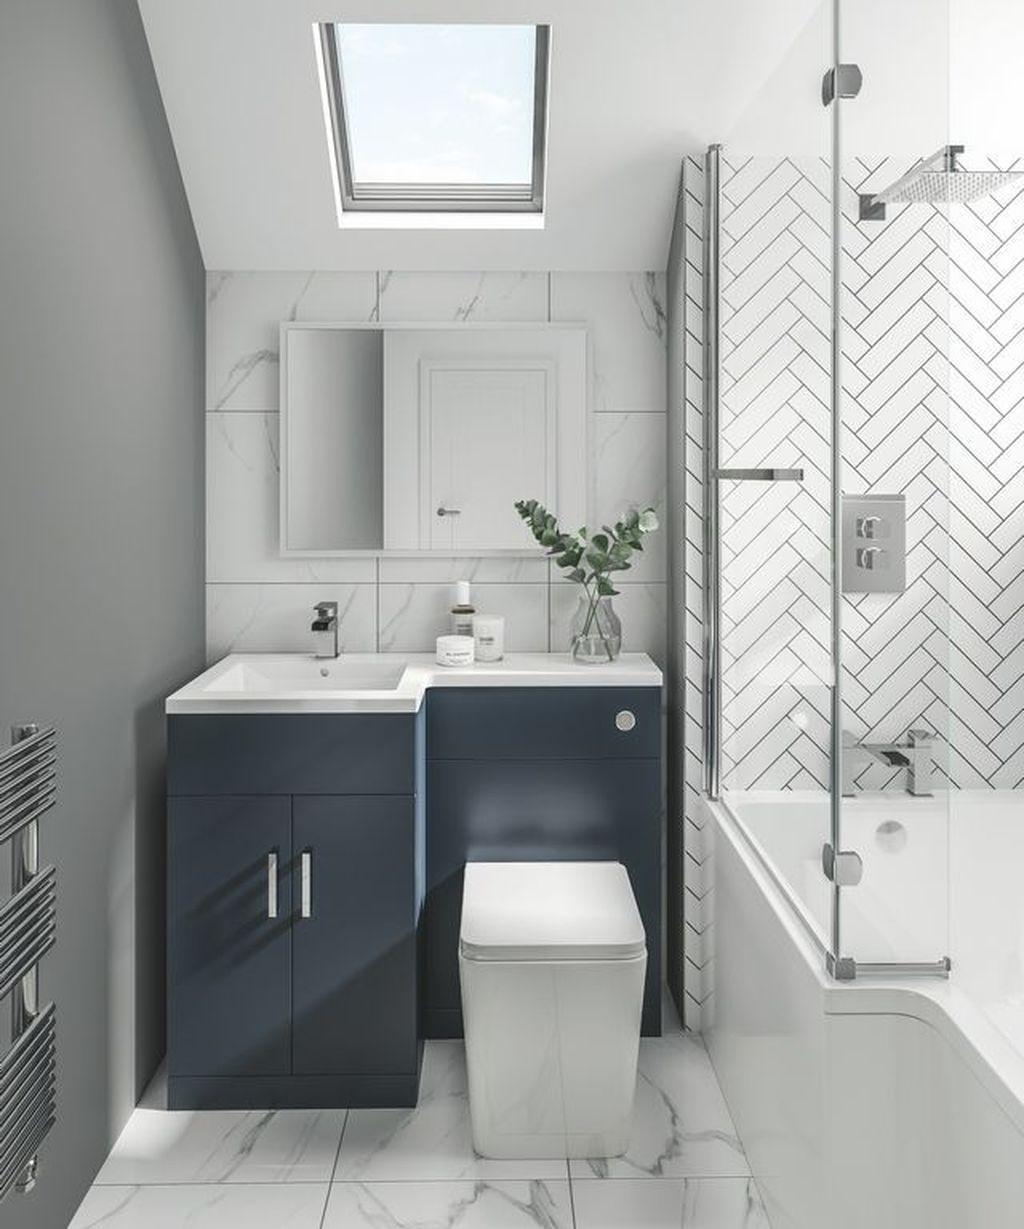 33 Fabulous Small Bathroom Design Ideas Pimphomee Small Bathroom Interior Small Bathroom Decor Small Bathroom Layout